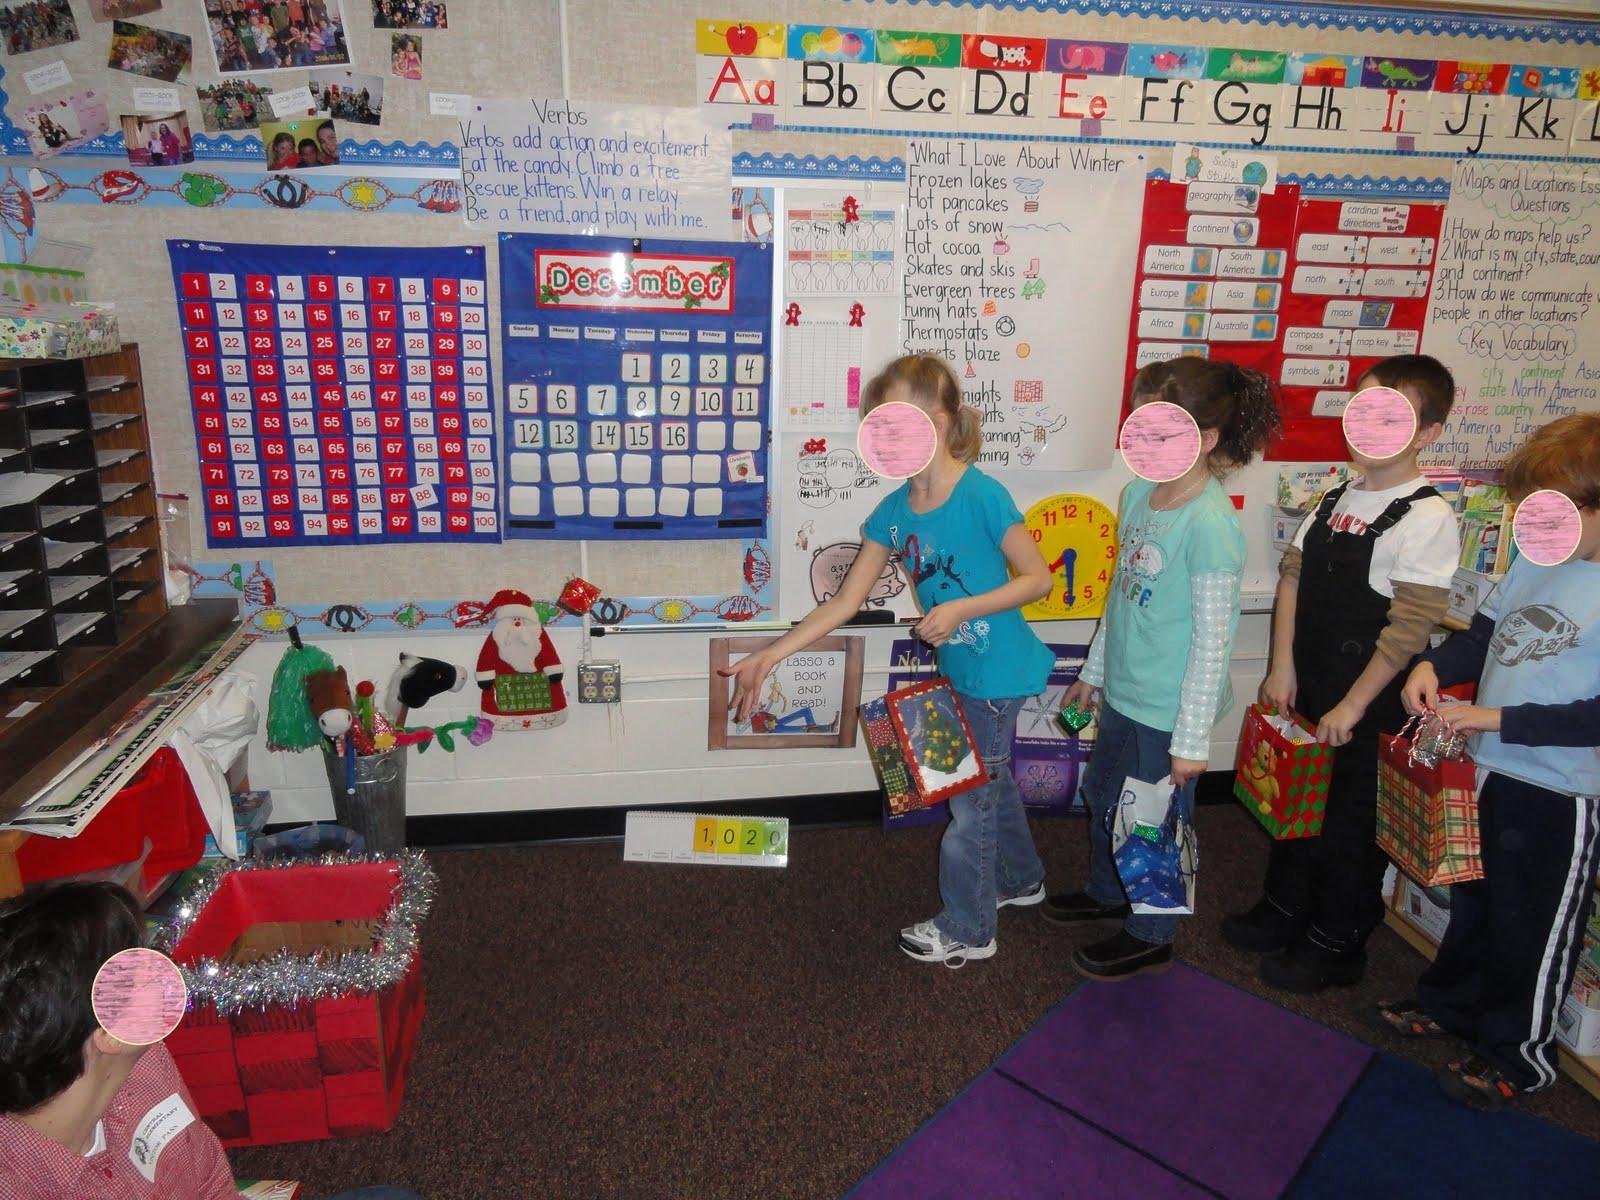 2Nd Grade Christmas Party Ideas  Wel e to the UNI corner Christmas Party Ideas